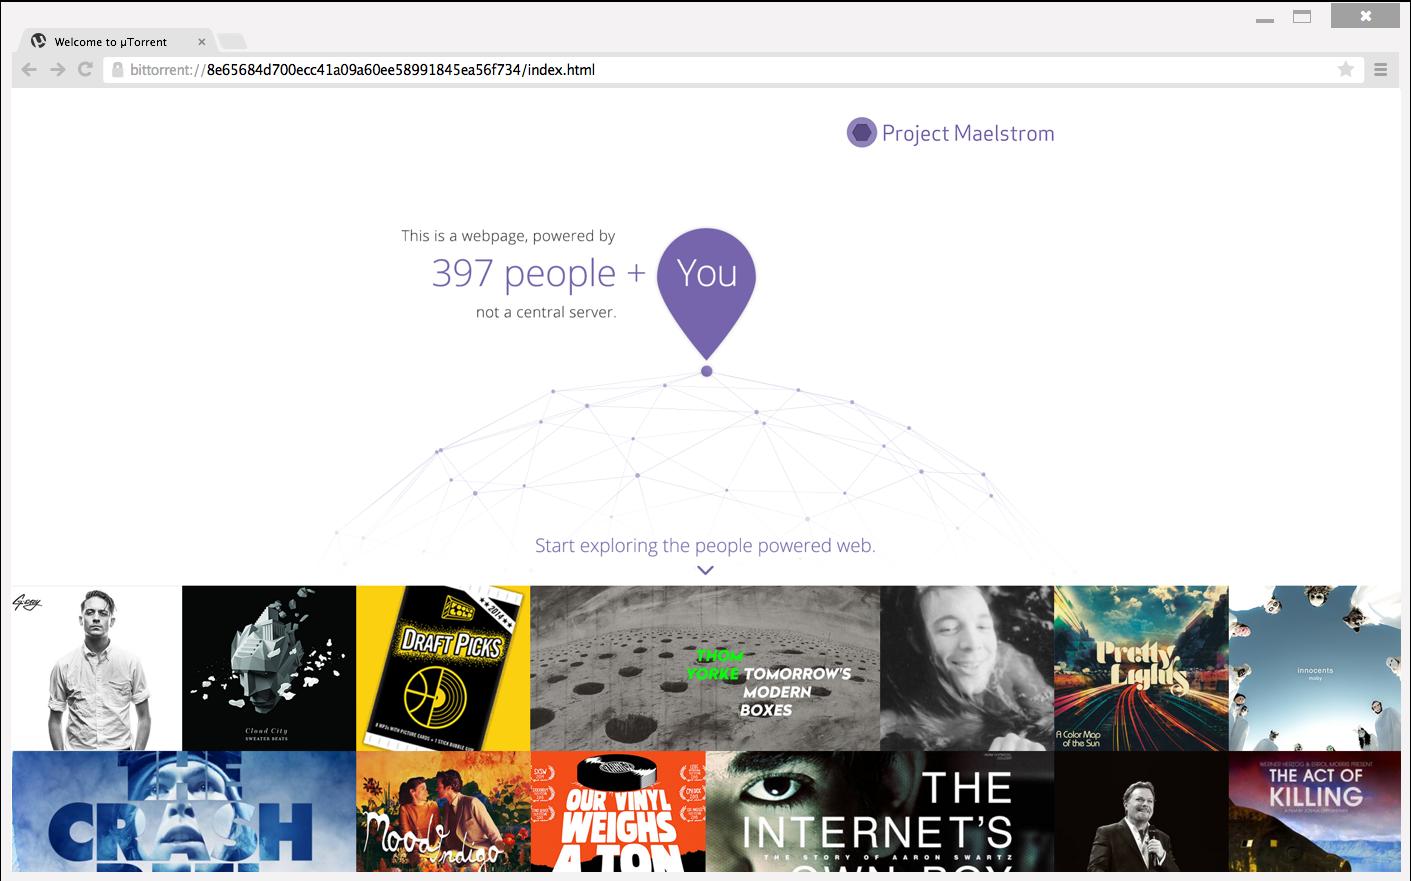 Project_Maelstrom_BitTorrent_Navigateur_Internet